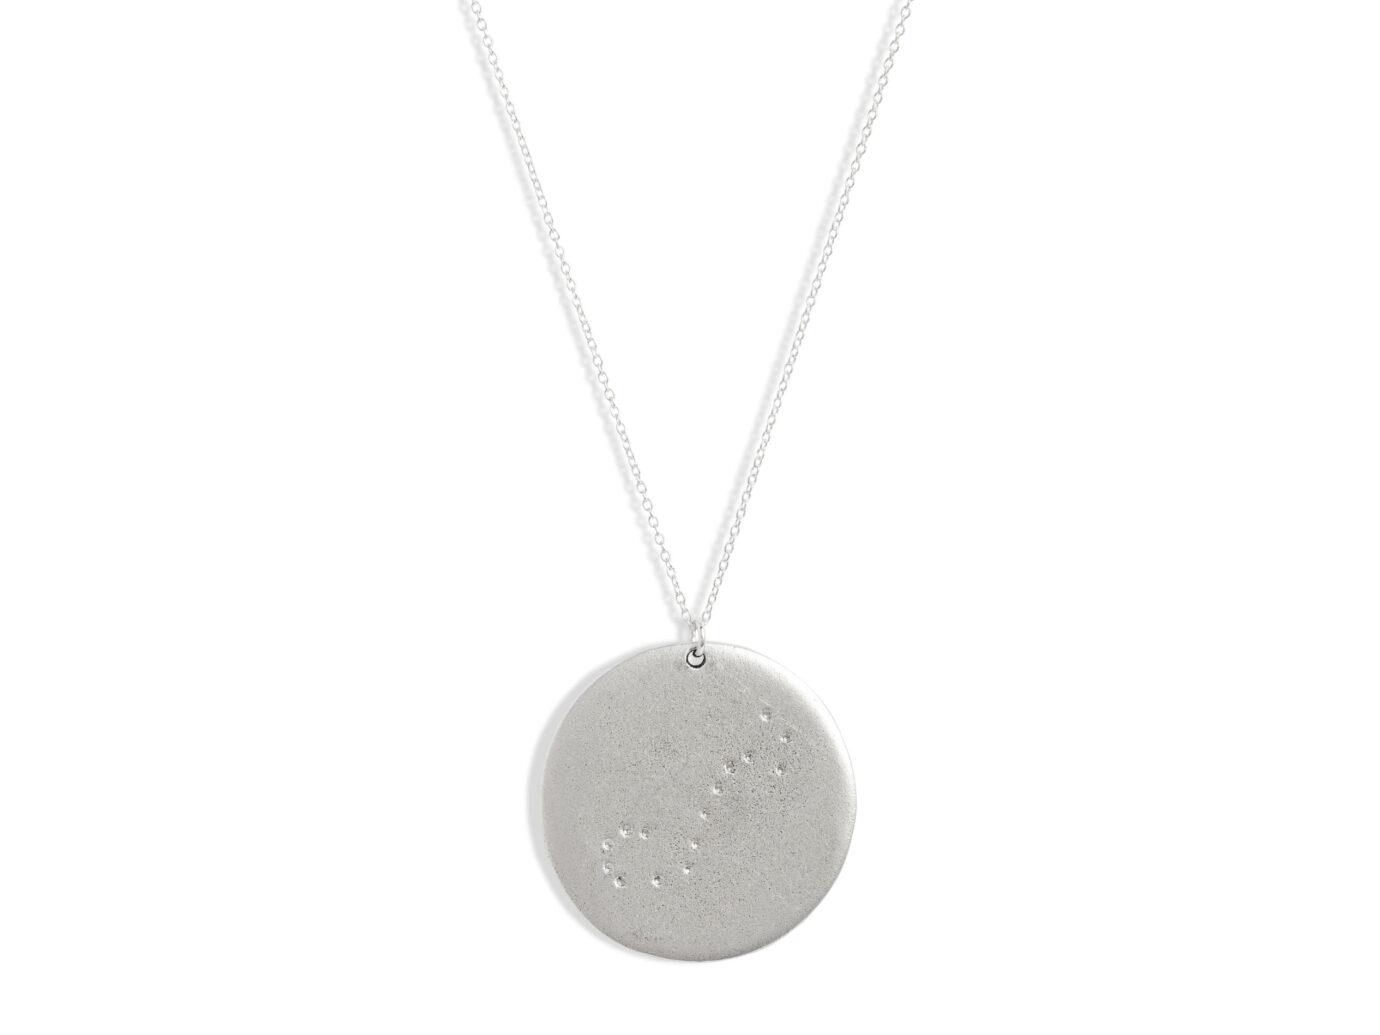 Set & Stones Zodiac Constellation Pendant Necklace